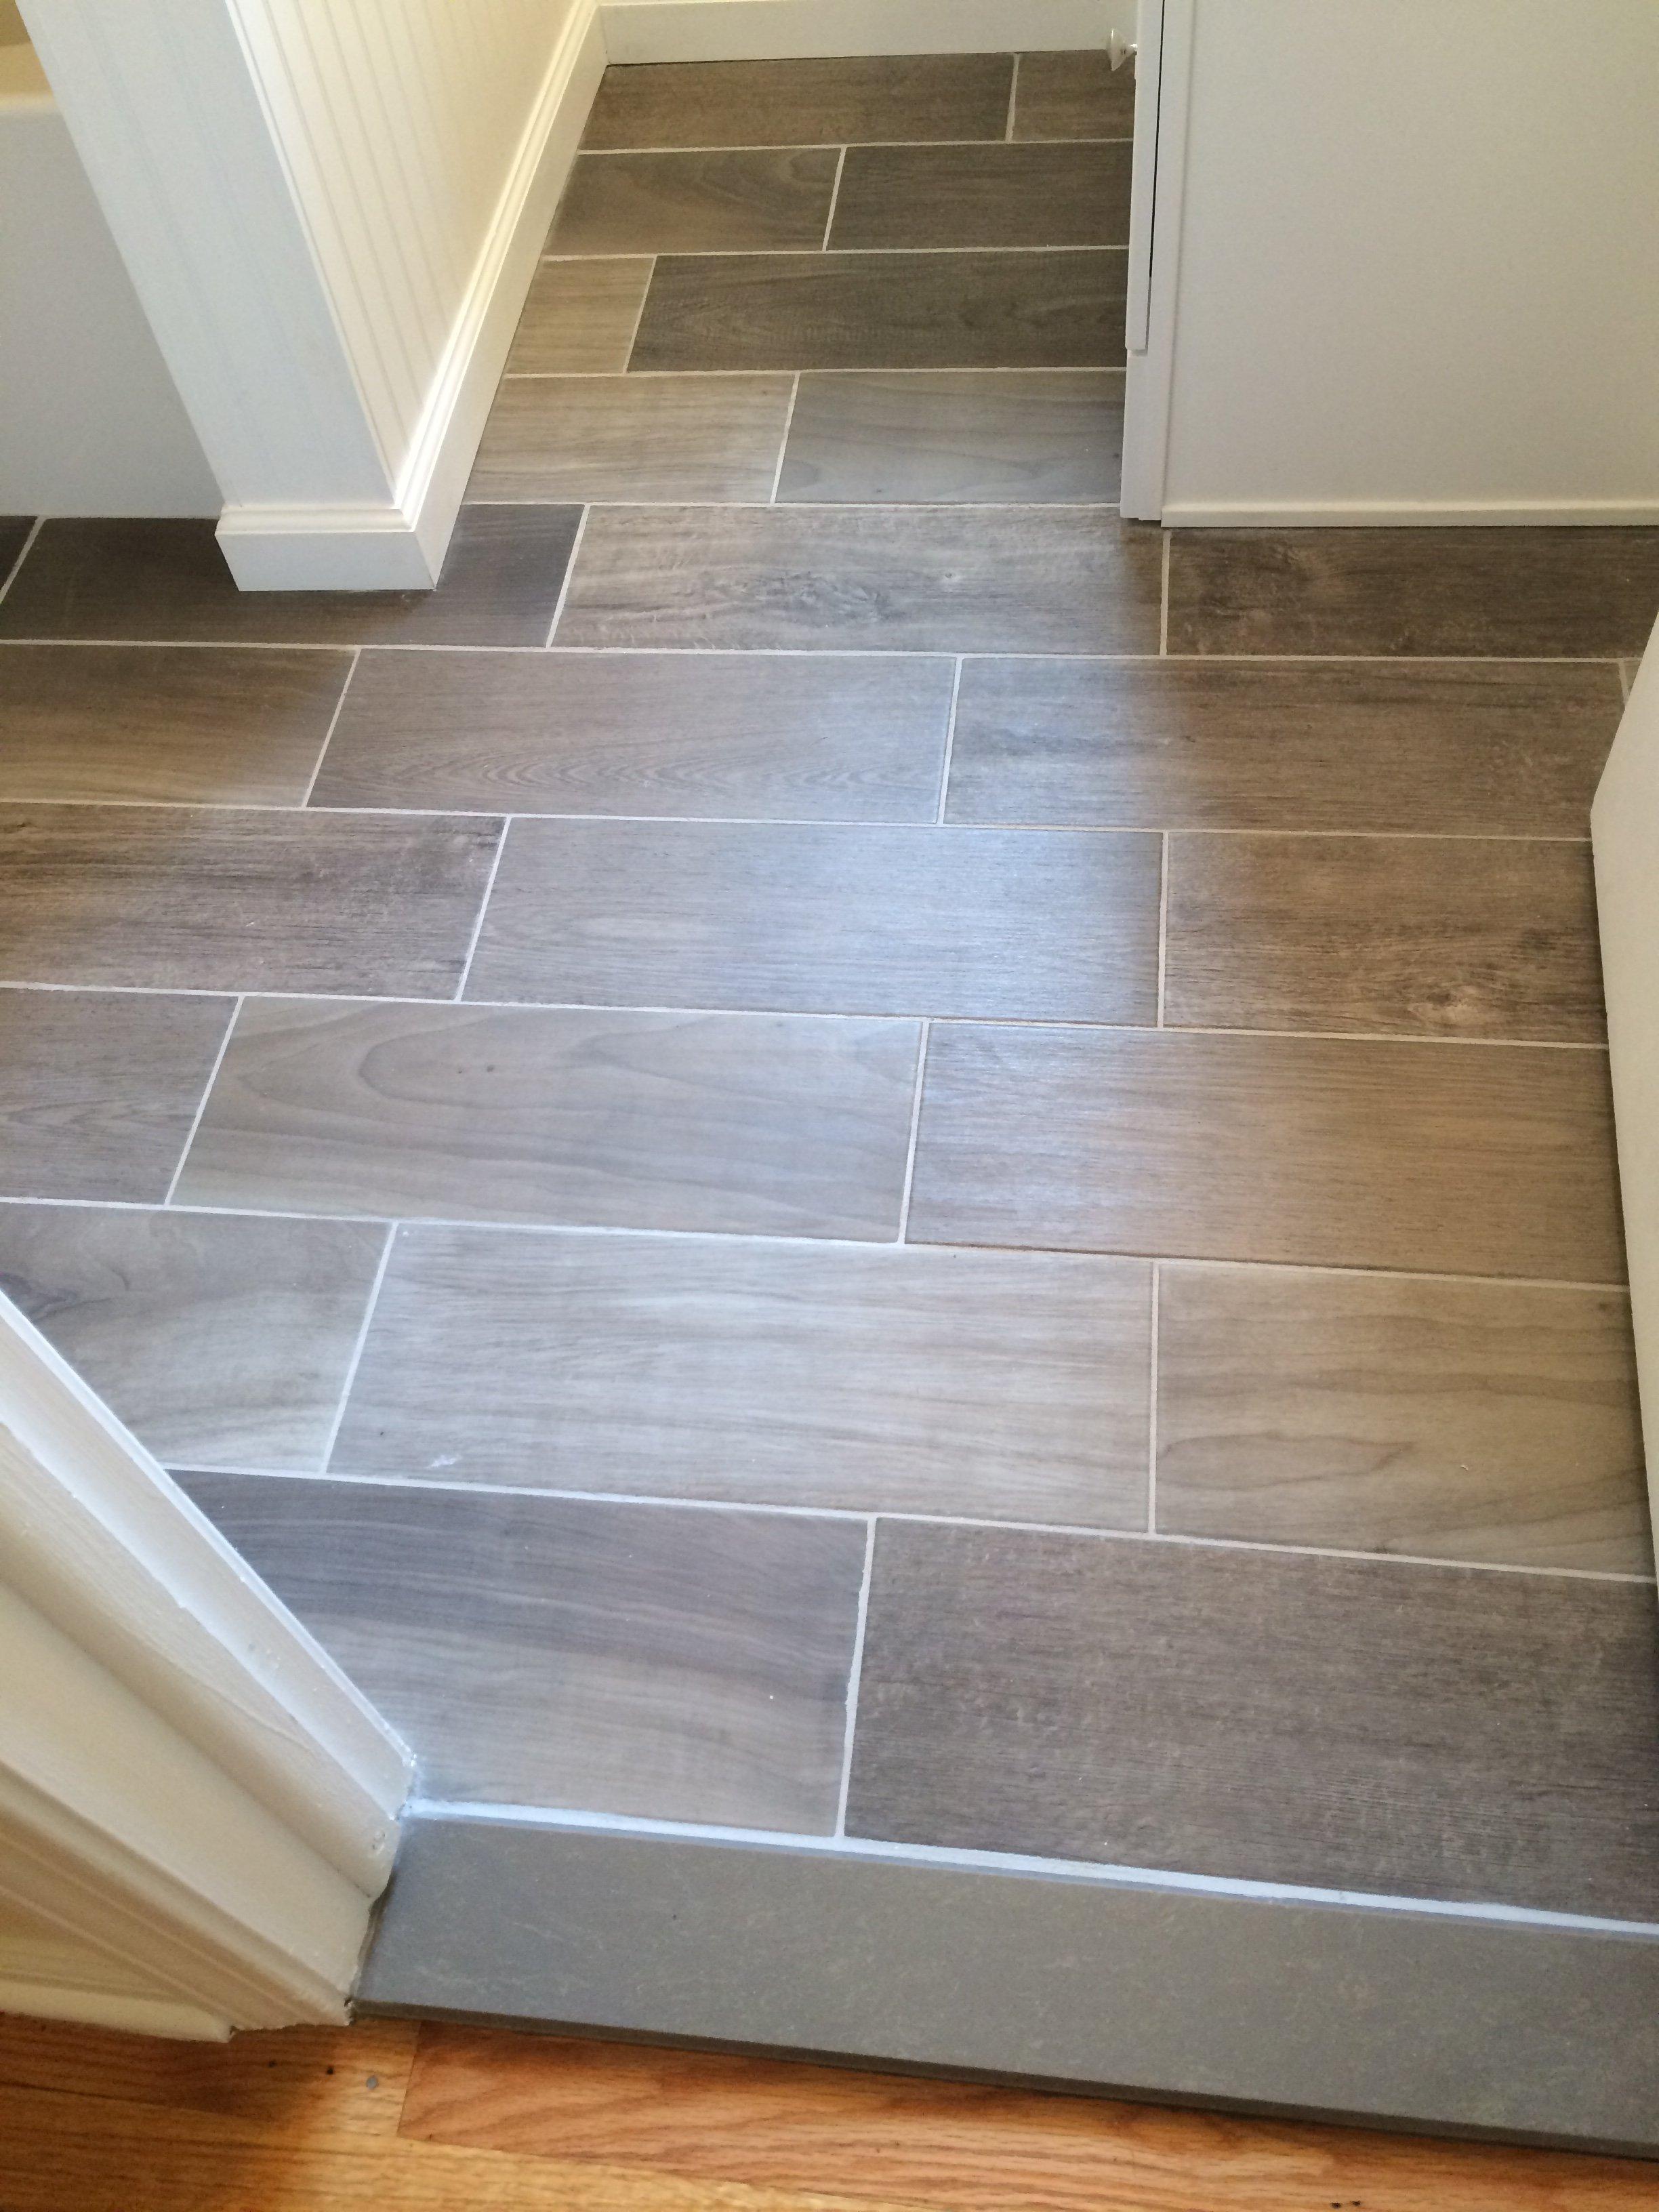 Floor Tile, Ceramic Tiles & Porcelain Tiles | Top Tile of Latham